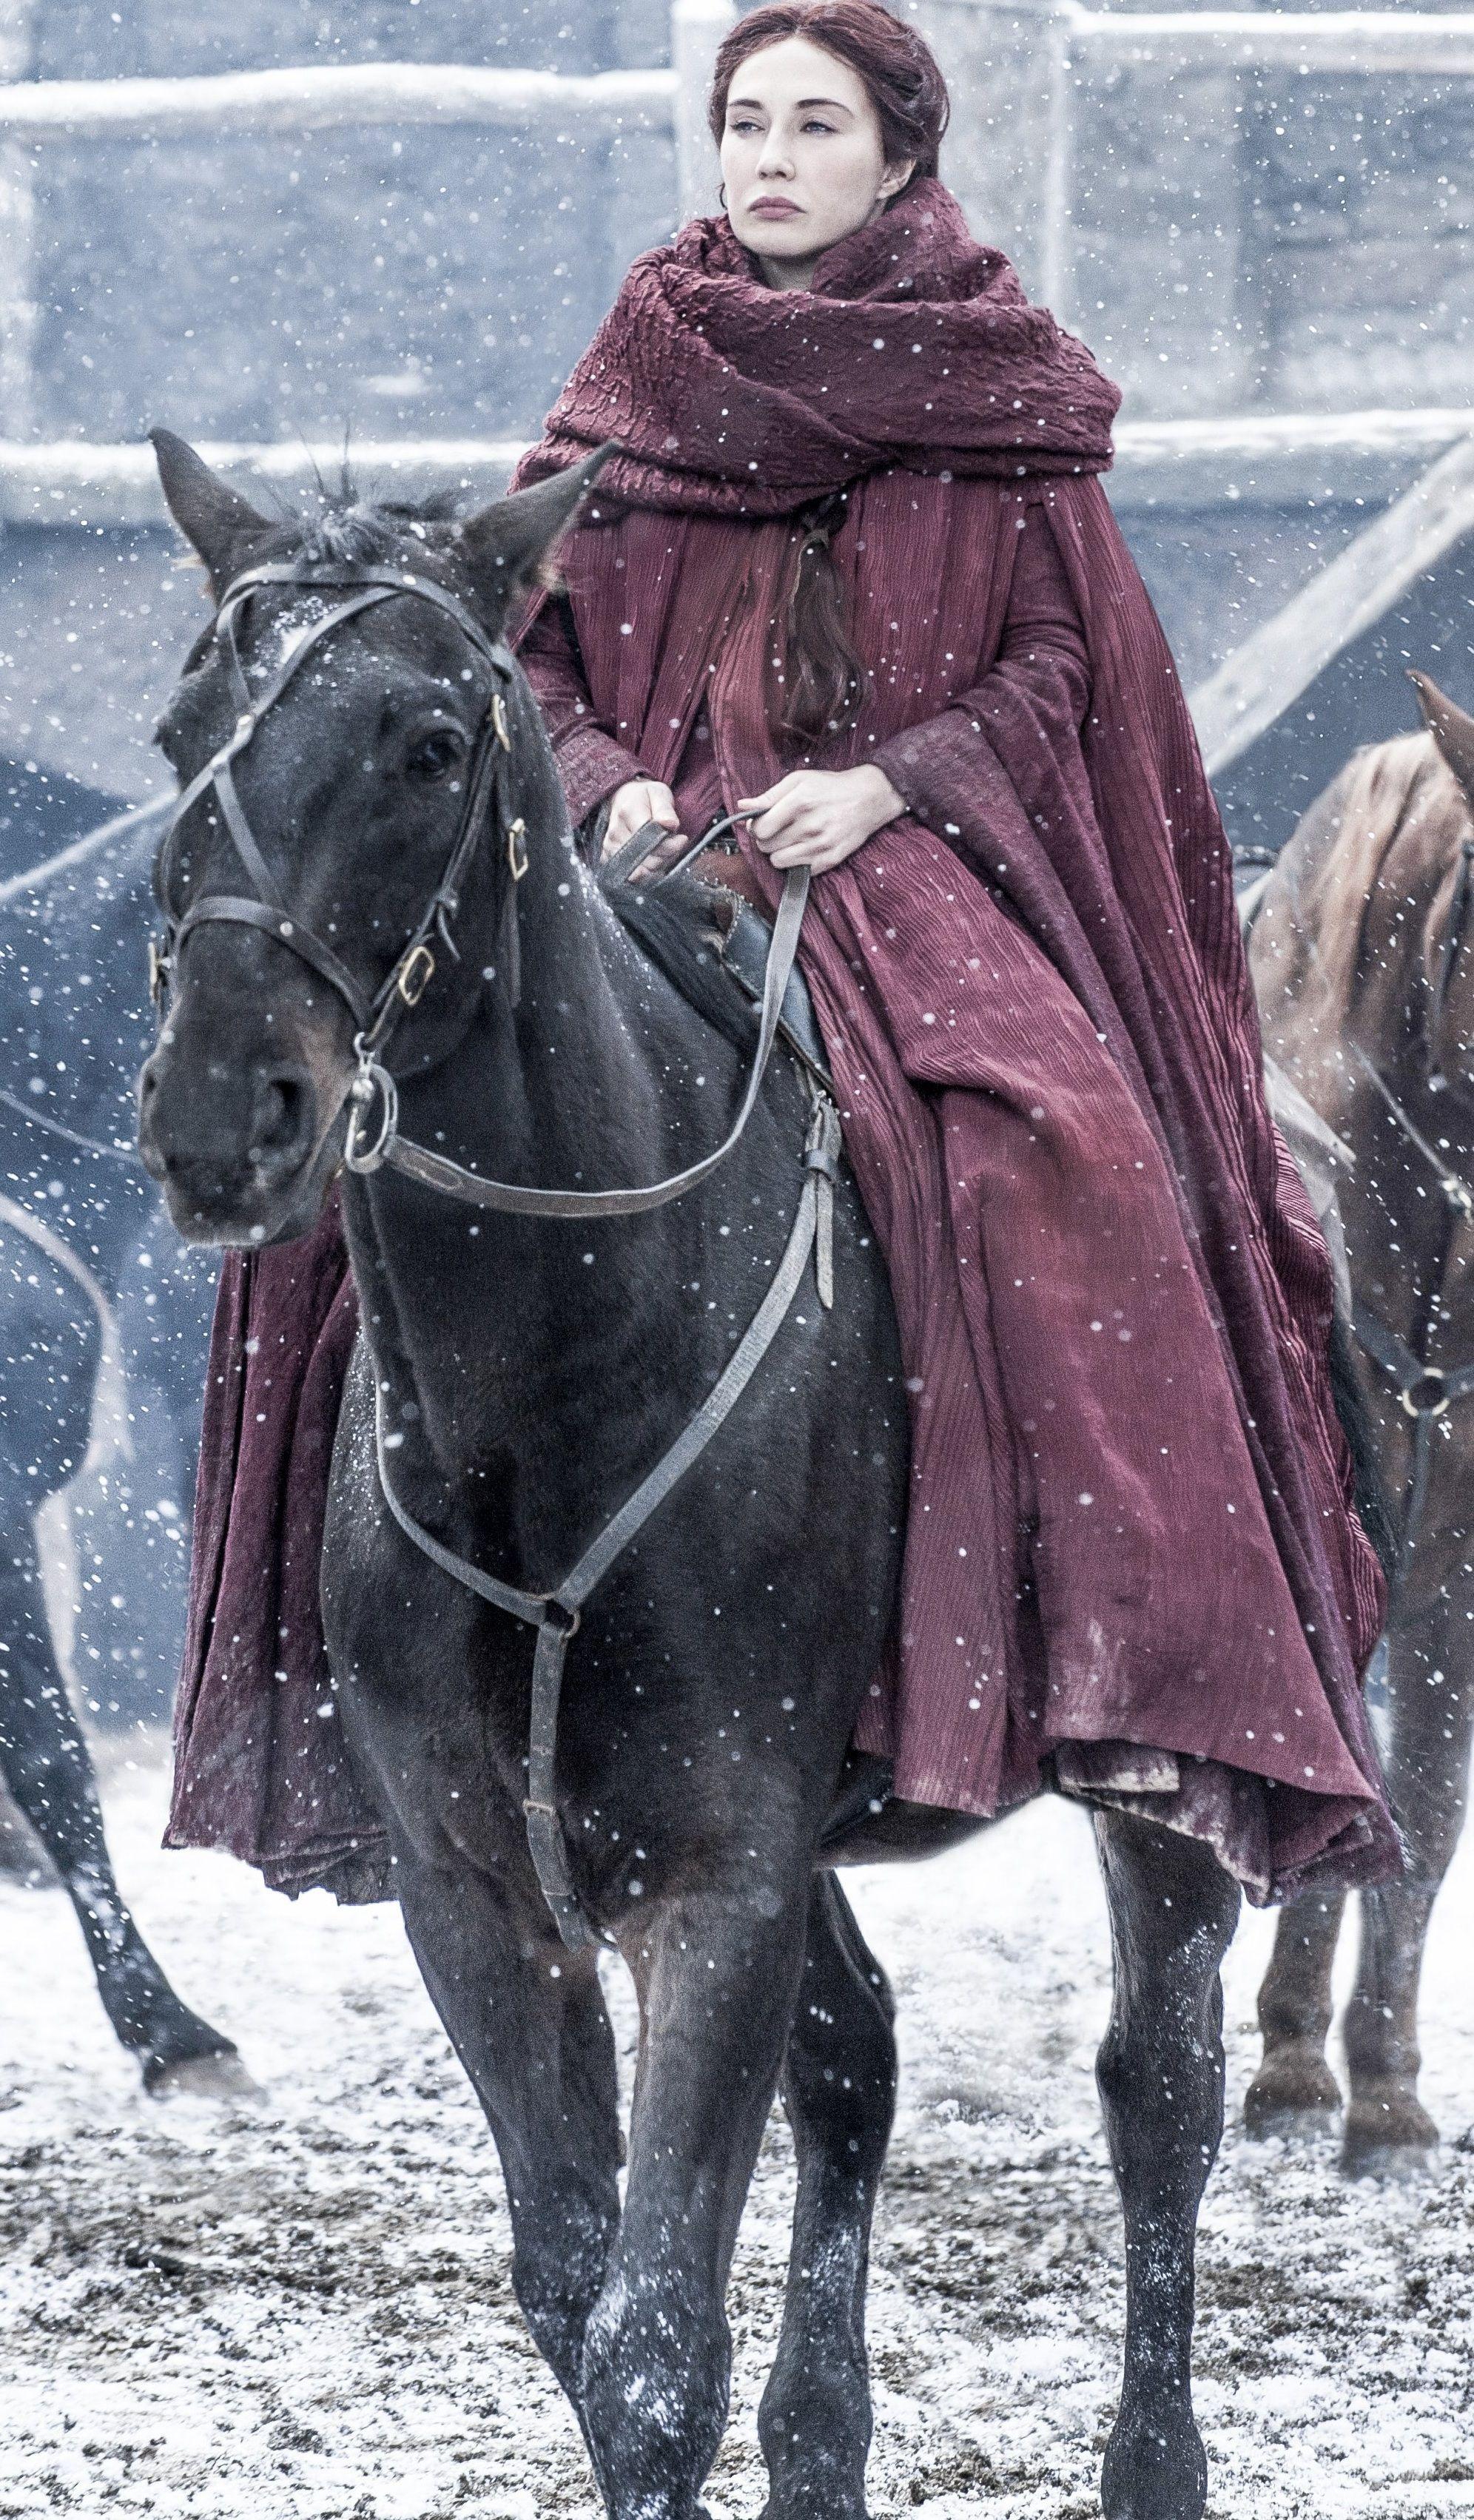 Game of Thrones, Season 6, Melisandre in 2019 Game of